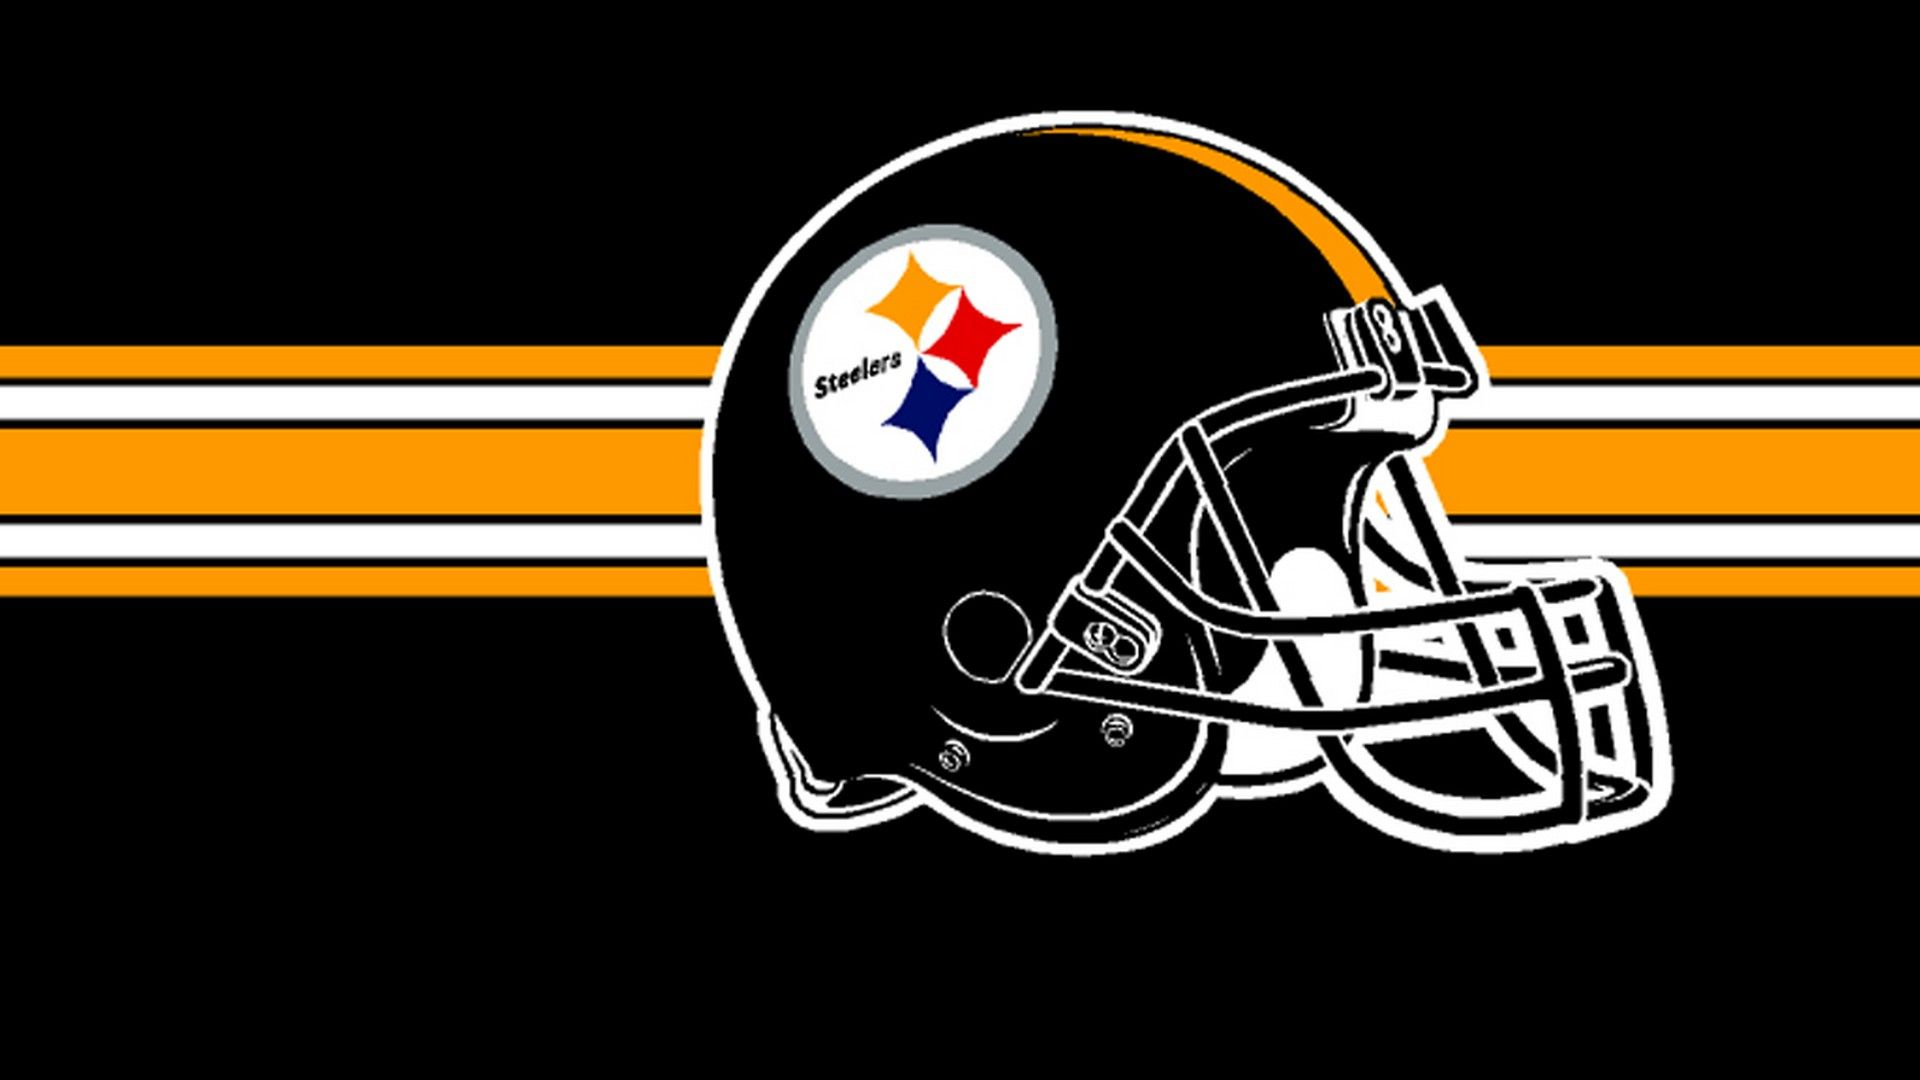 Nfl Wallpapers Football Wallpaper Steelers Football Mac Backgrounds